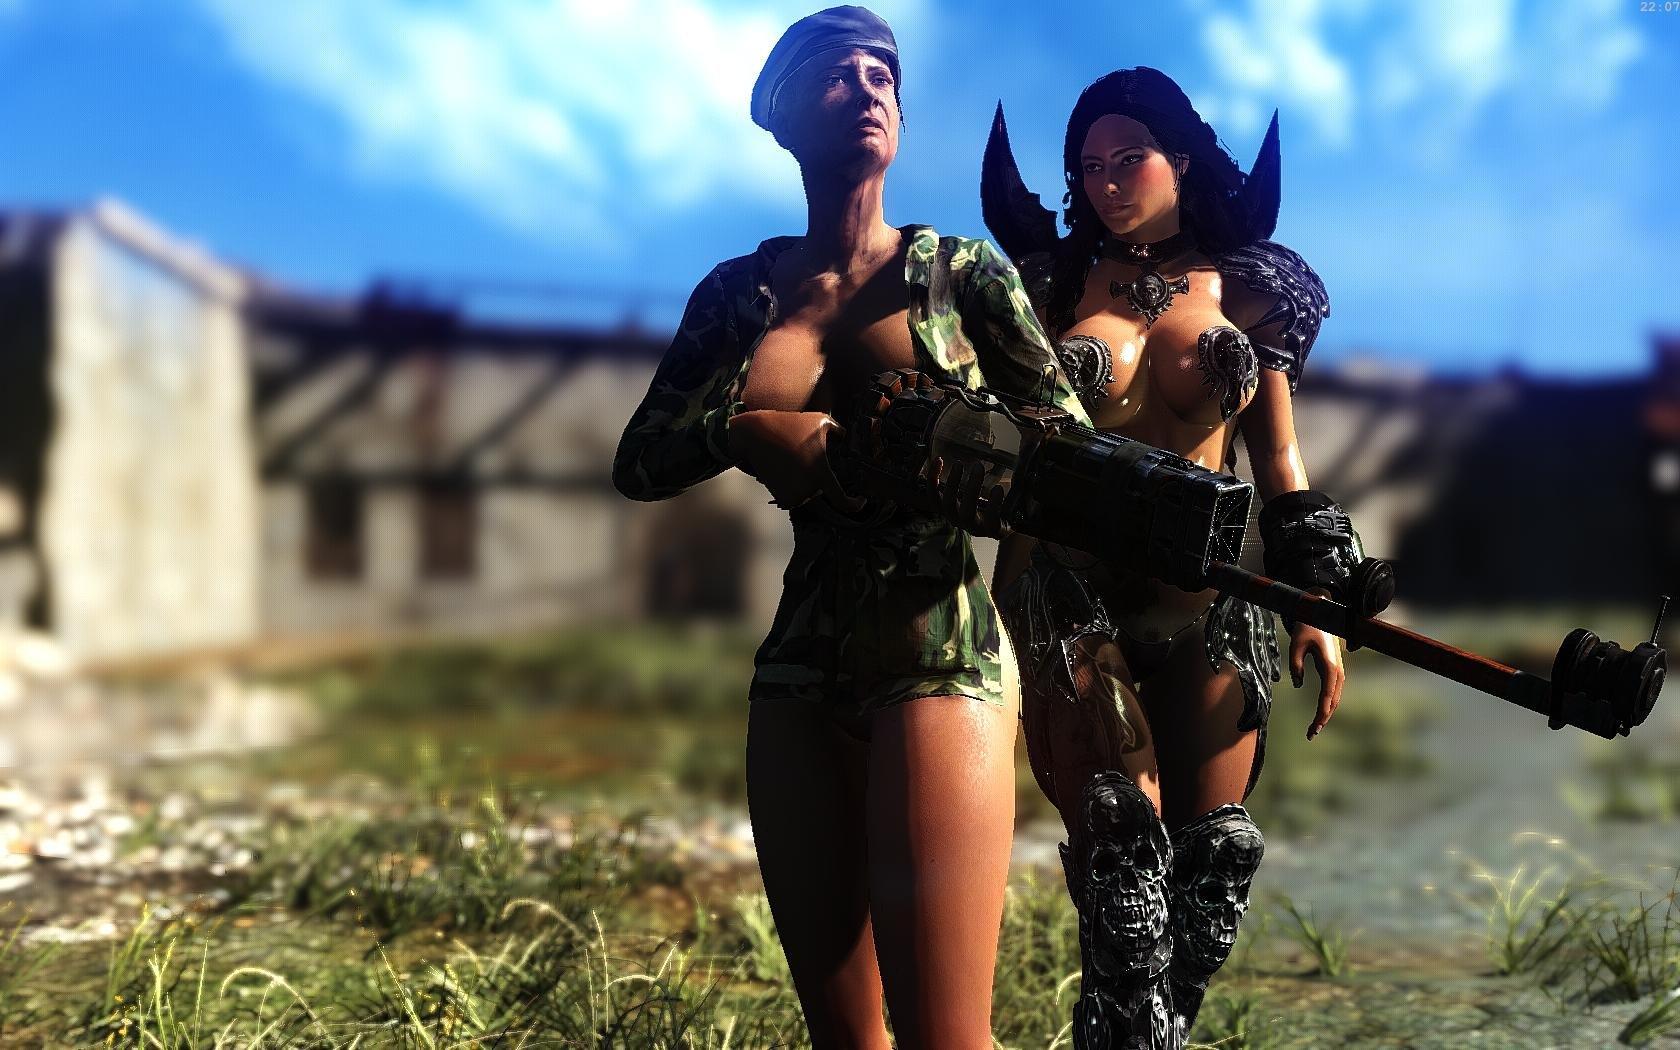 Fallout4 2019-02-04 22-07-38-61